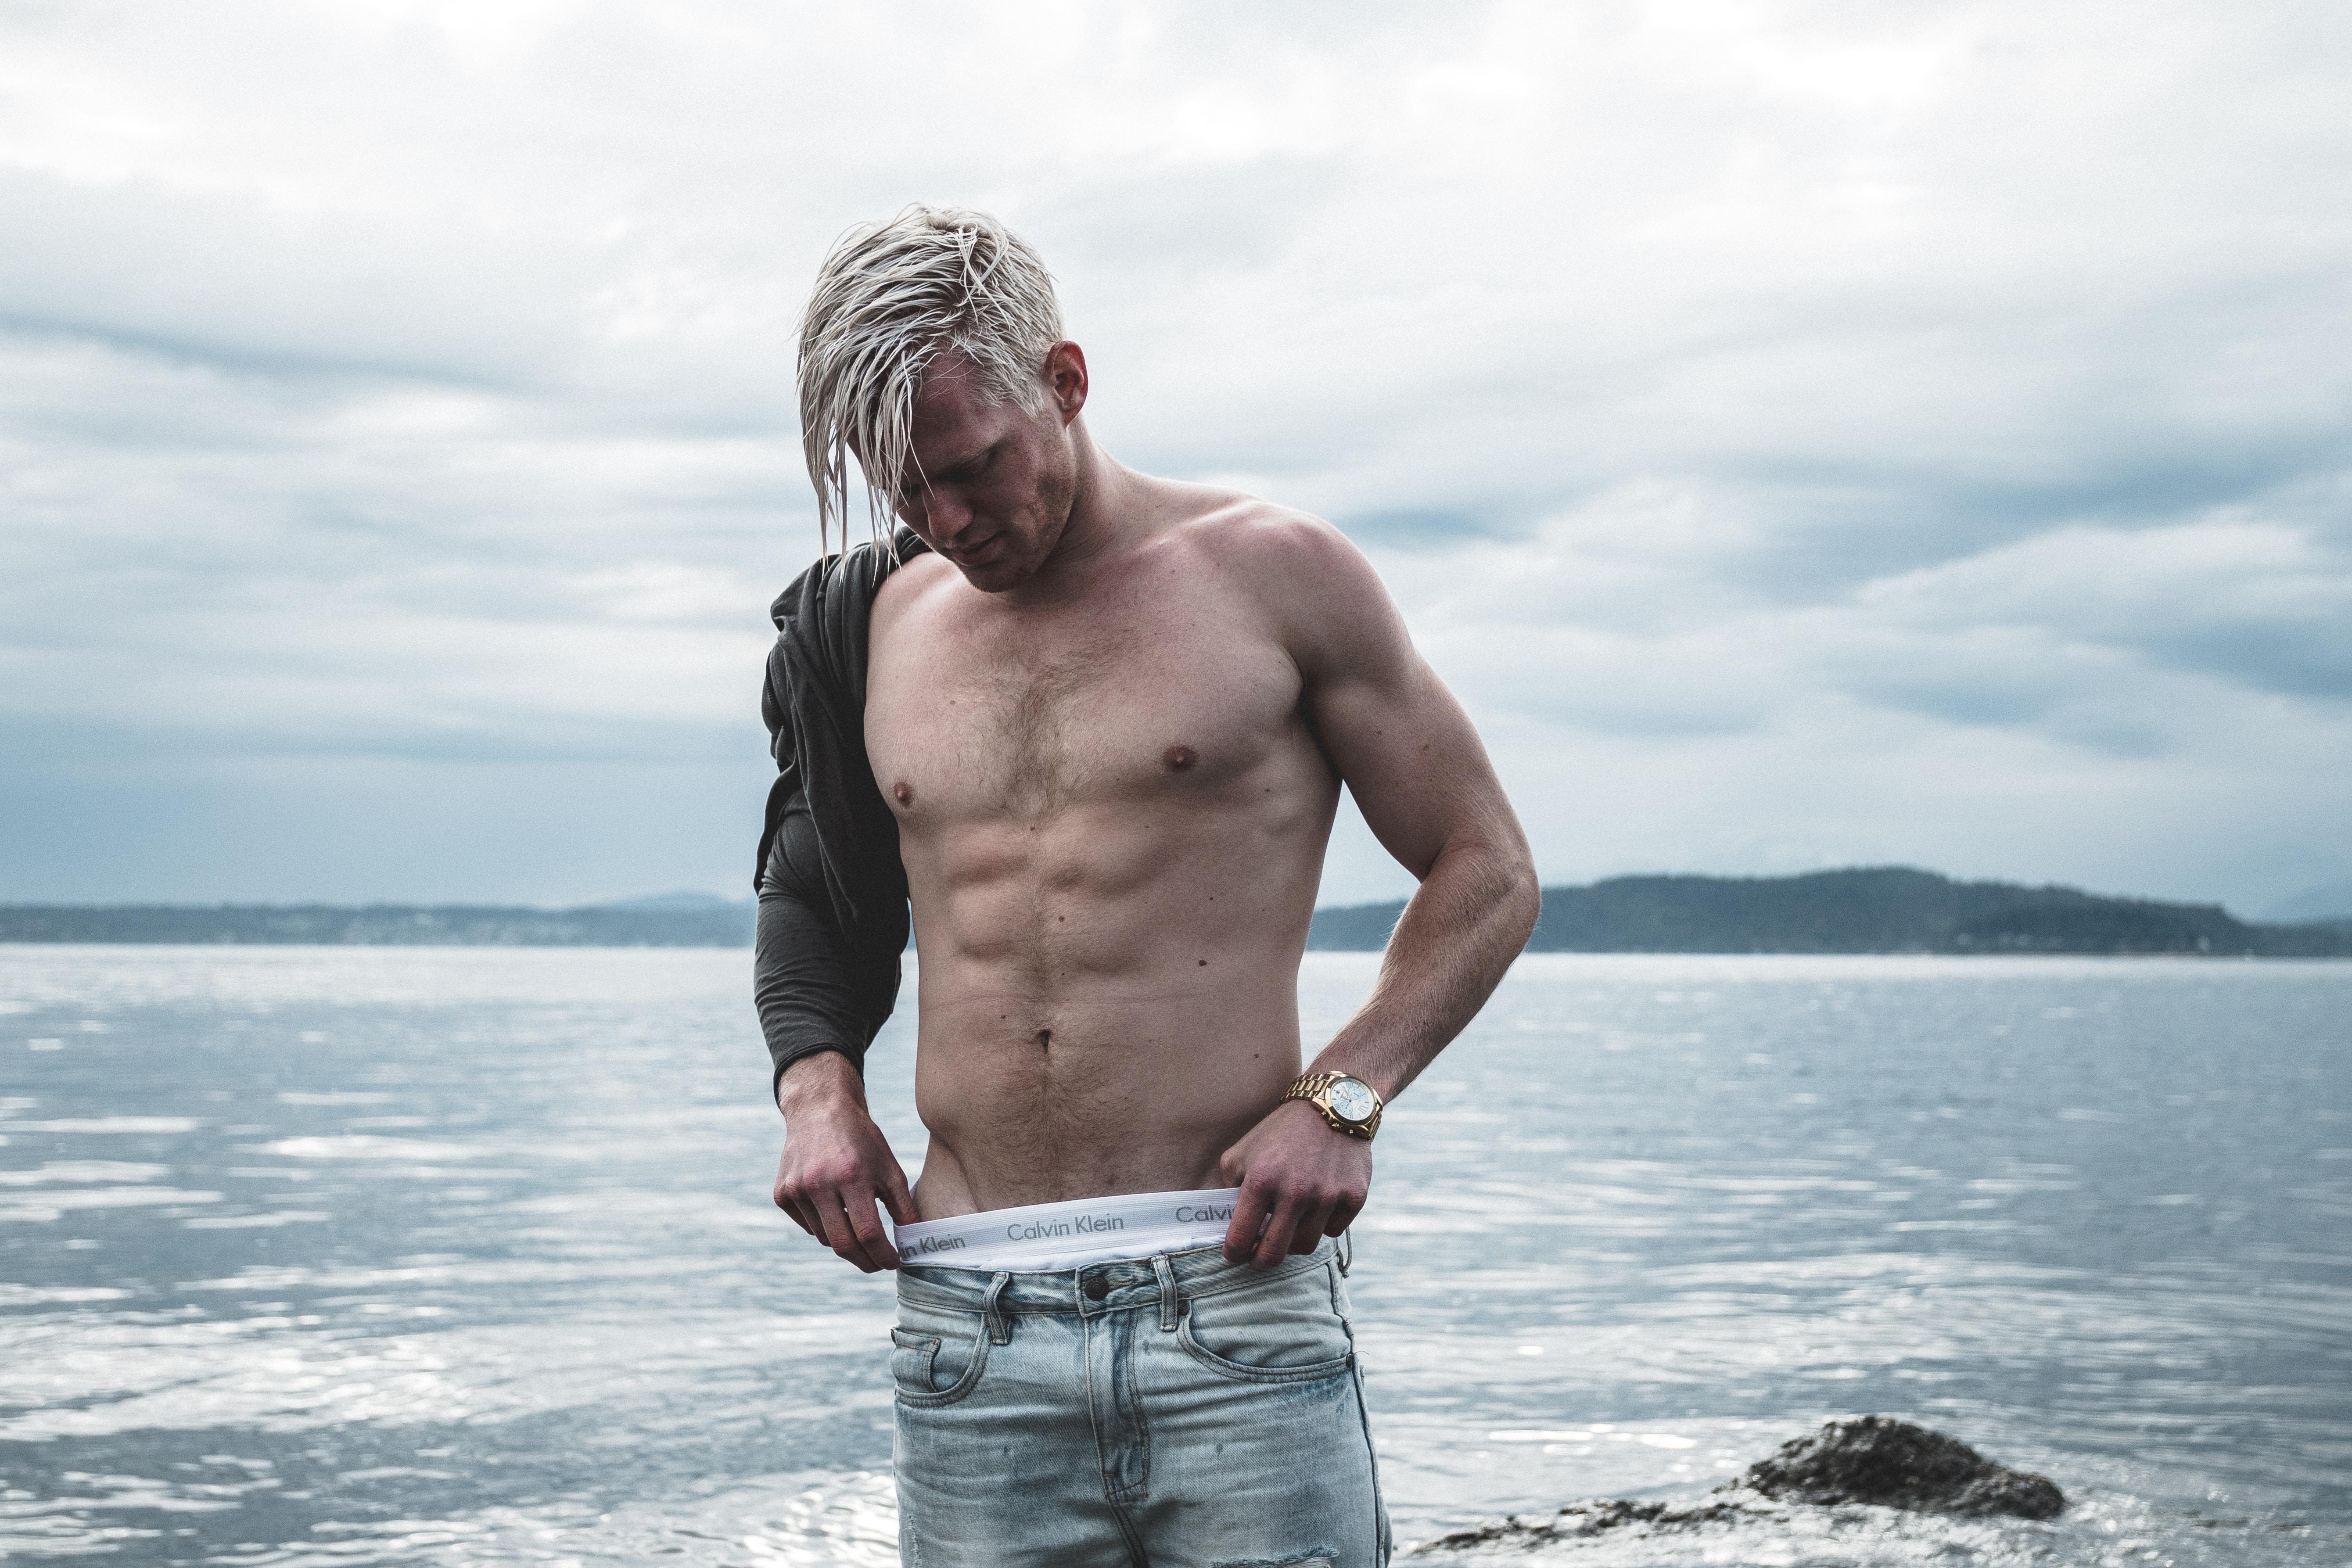 topless man wearing gray denim bottoms standing on shore at daytime